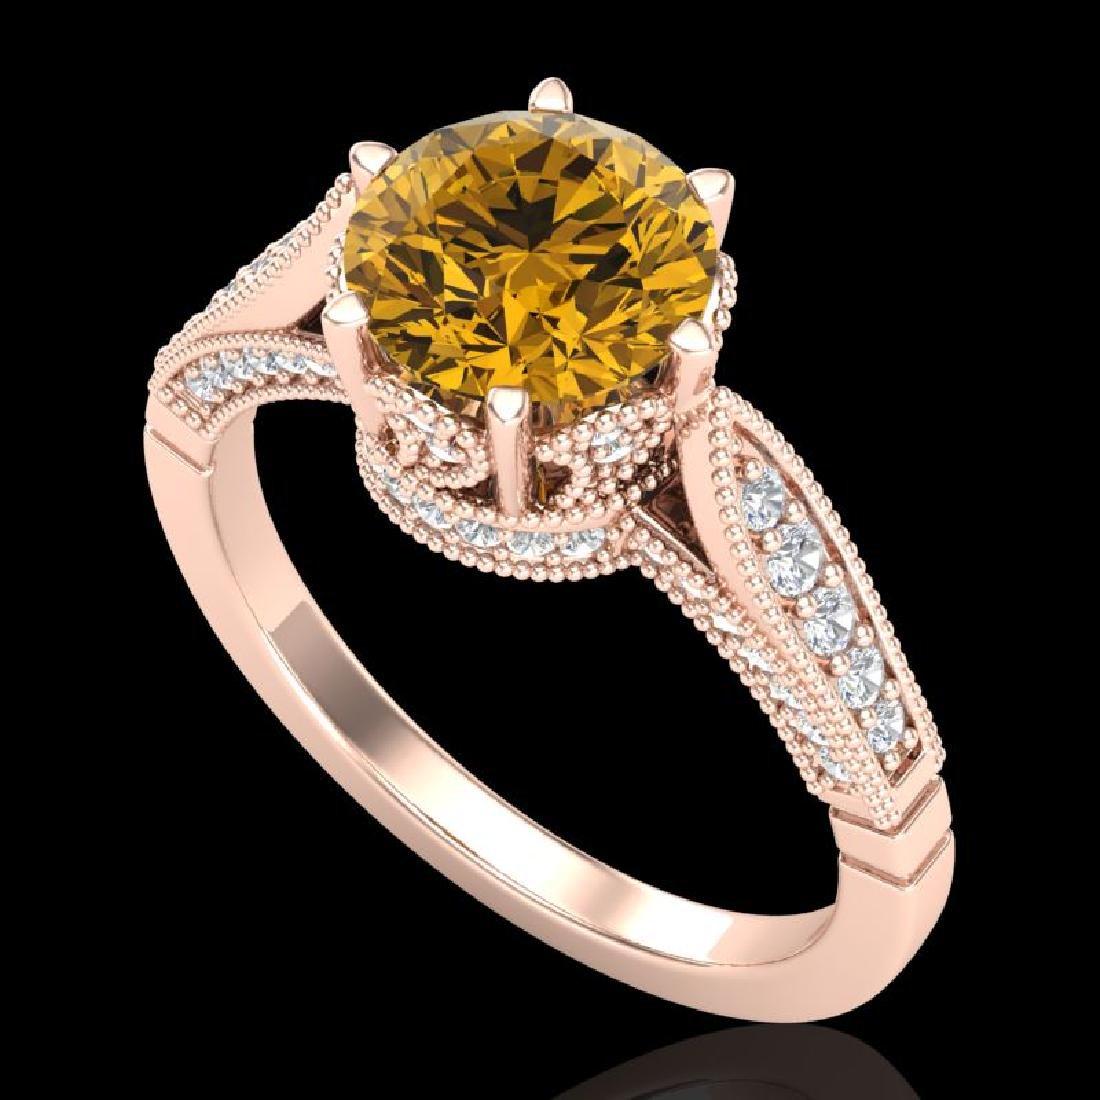 2.2 CTW Intense Fancy Yellow Diamond Engagement Art